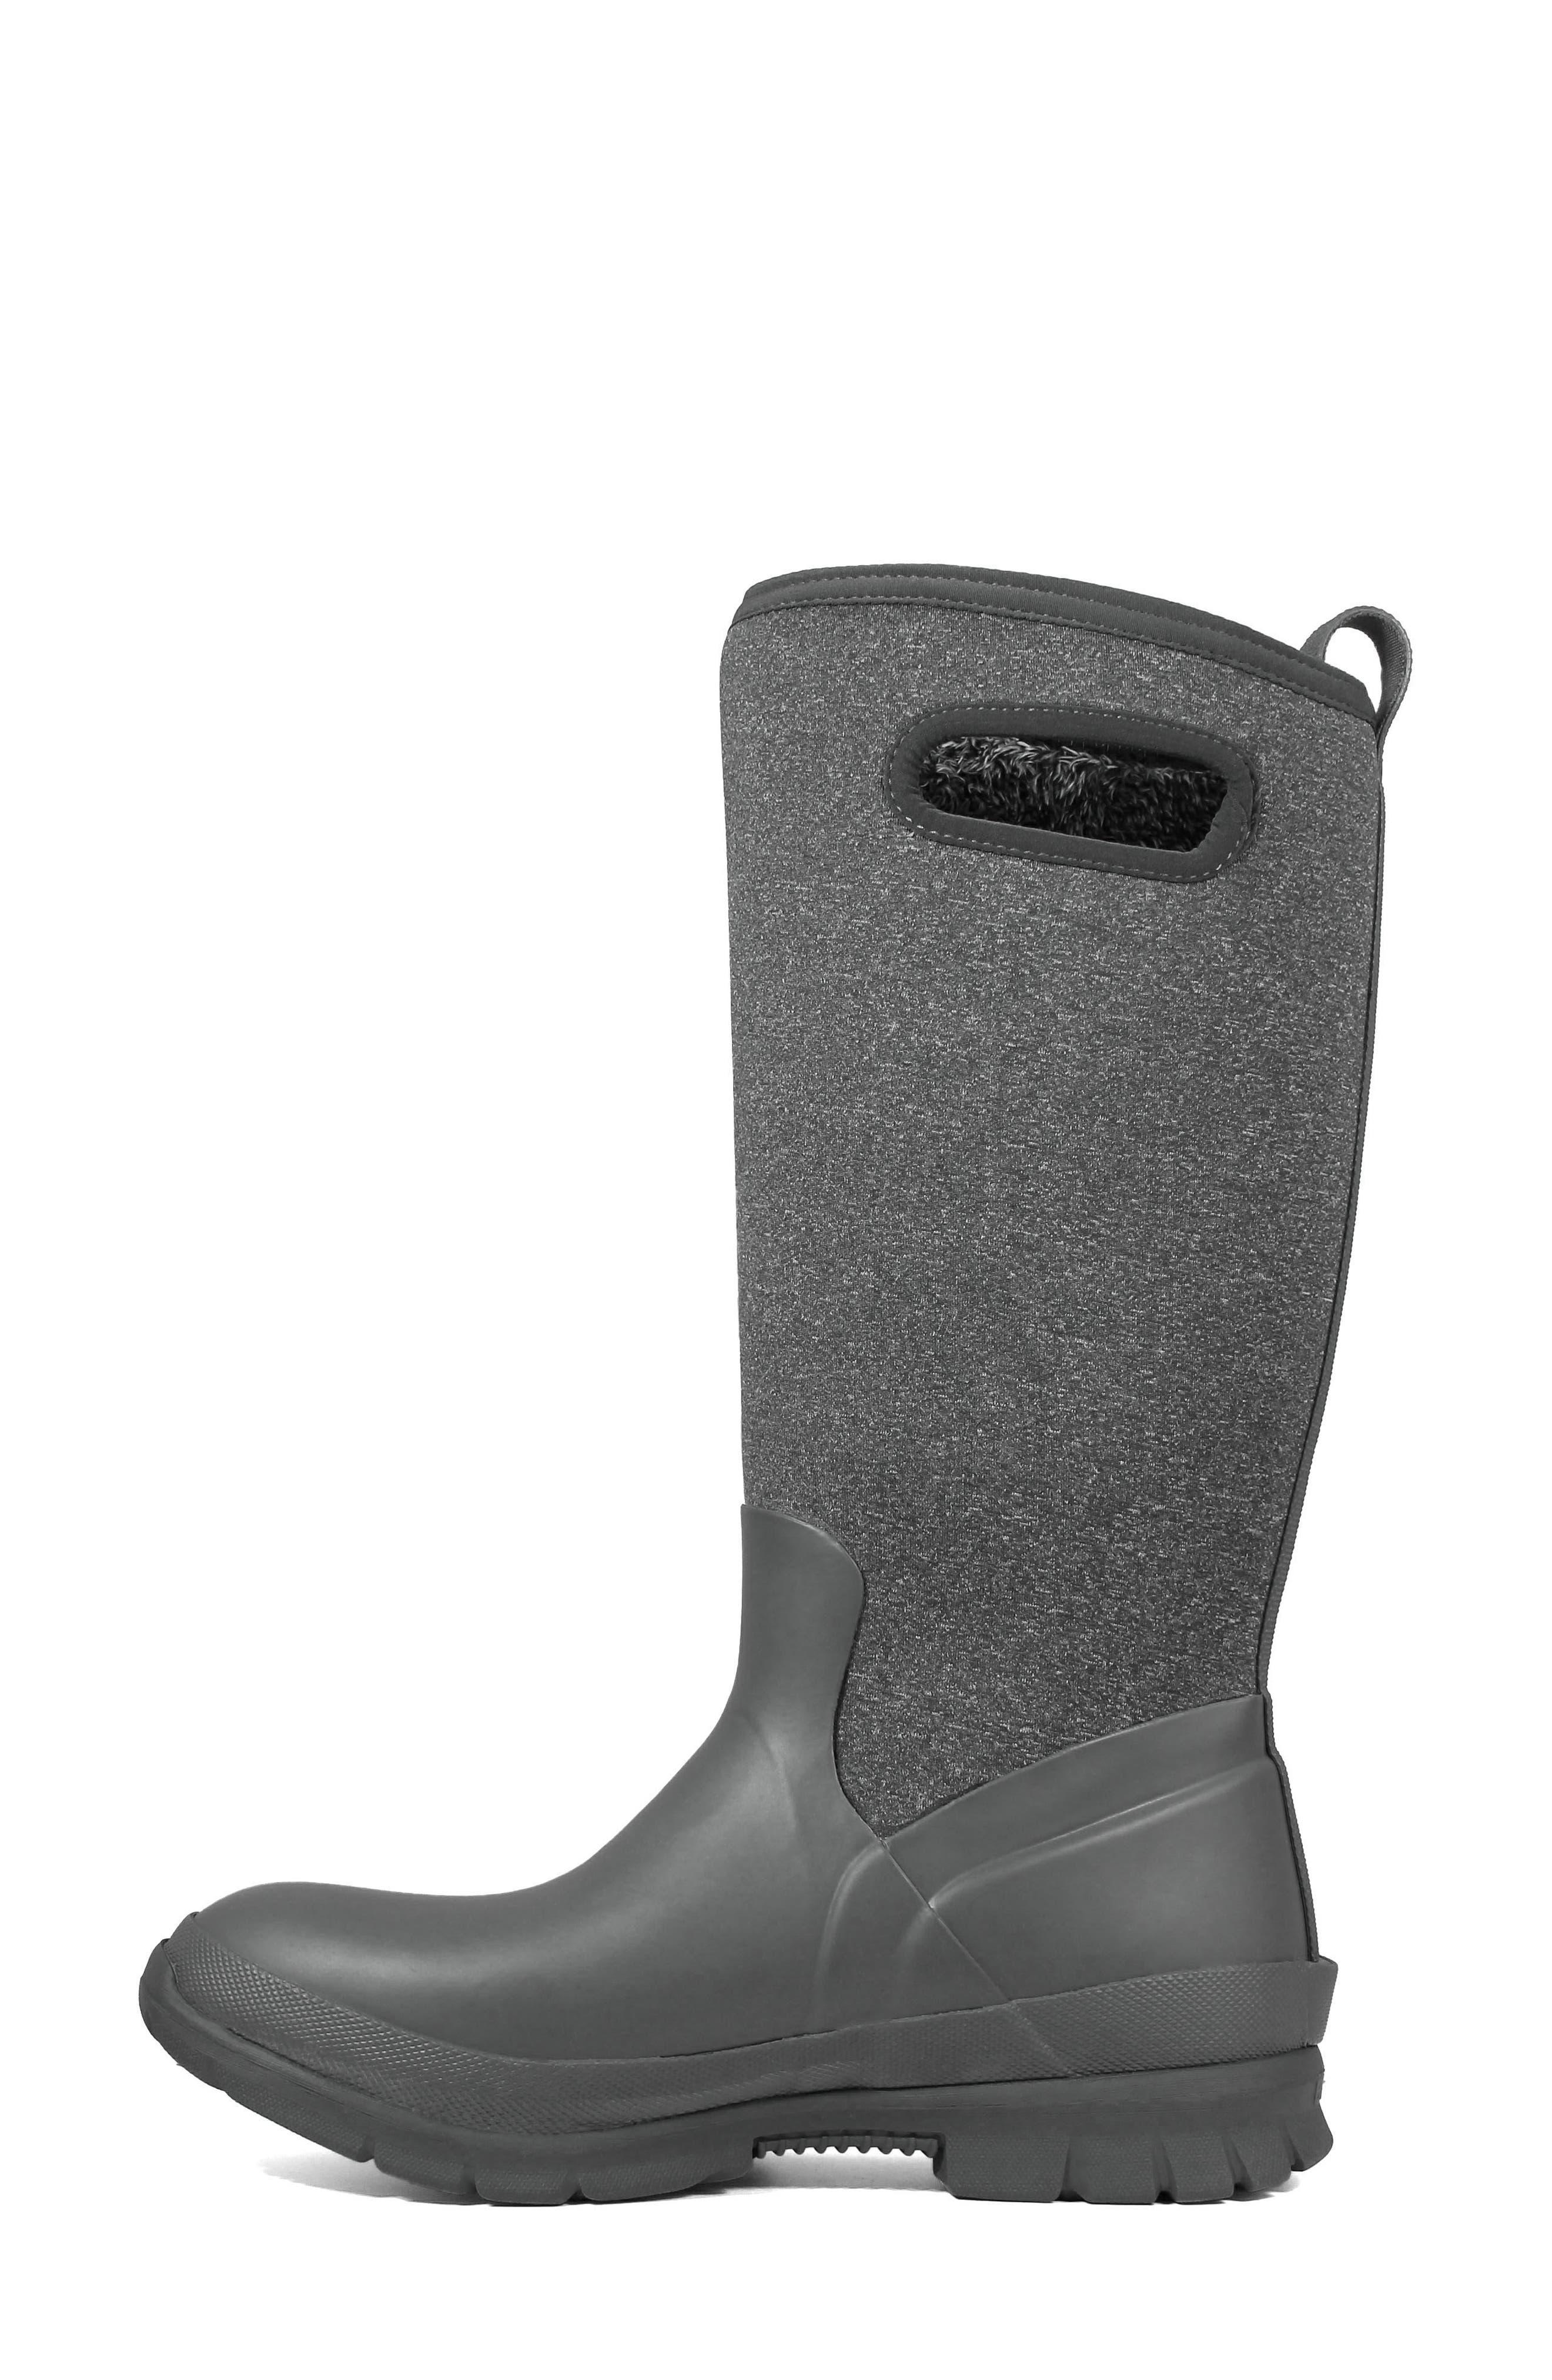 Crandall Waterproof Tall Boot,                             Alternate thumbnail 8, color,                             DARK GREY